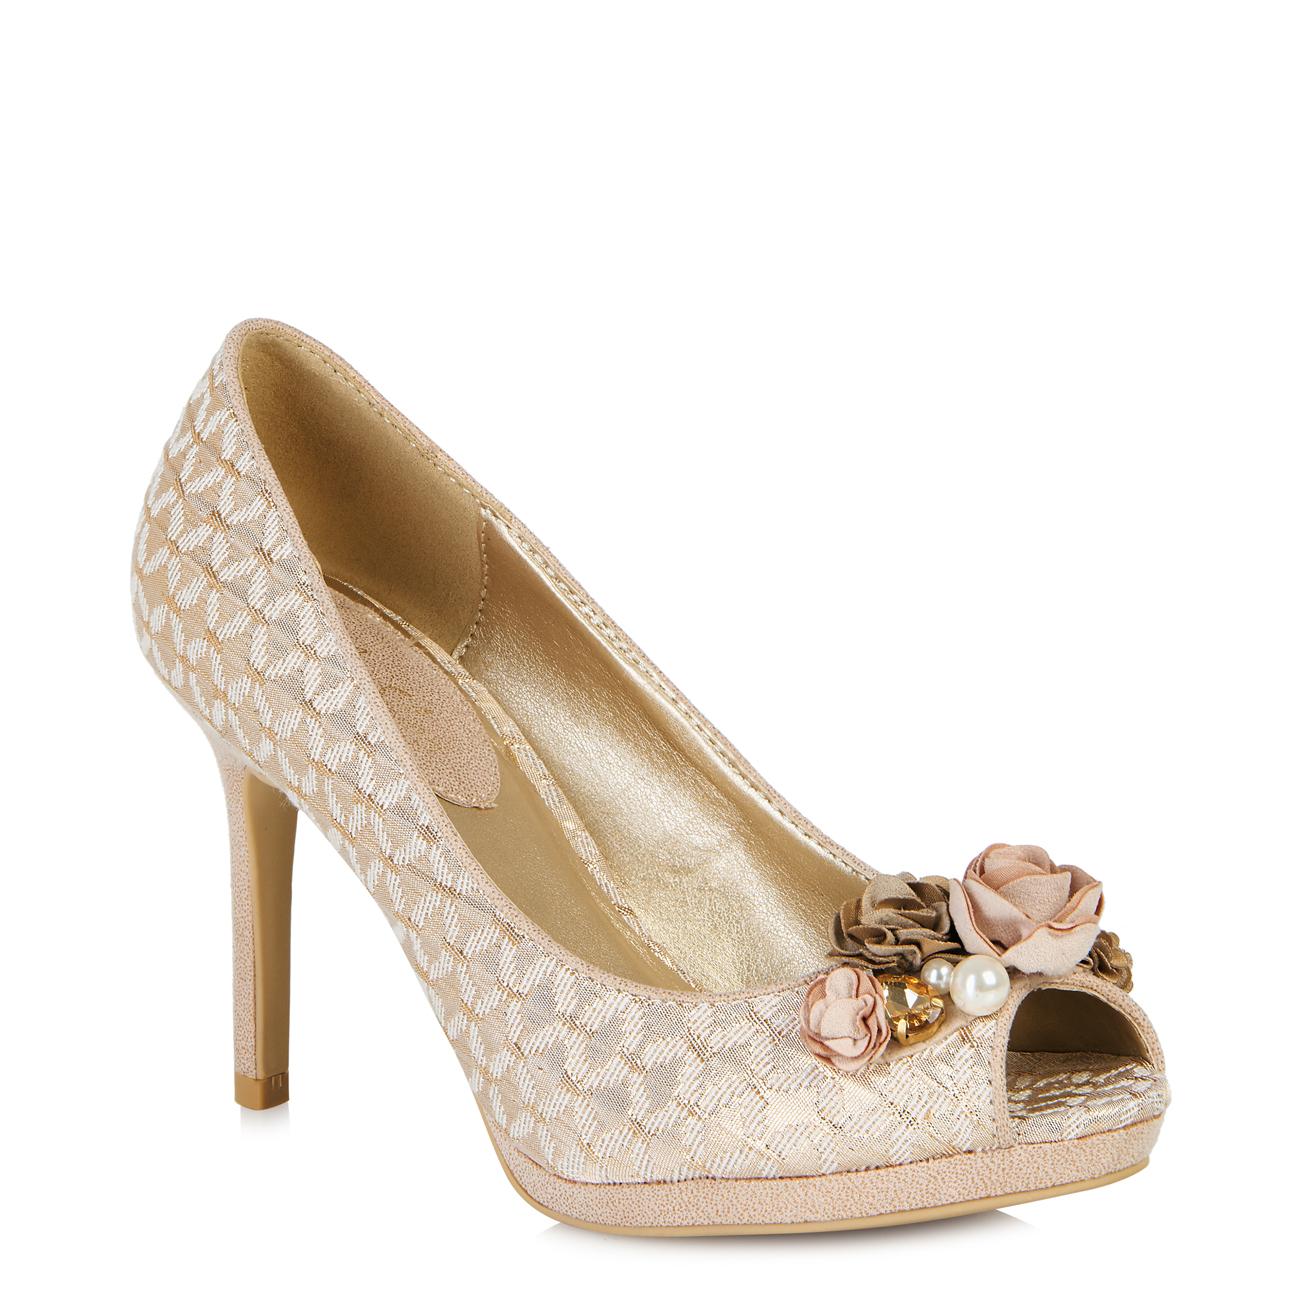 Ruby Shoo Sonia Jewelled Peeptoe Shoe Silver Rose Gold ...